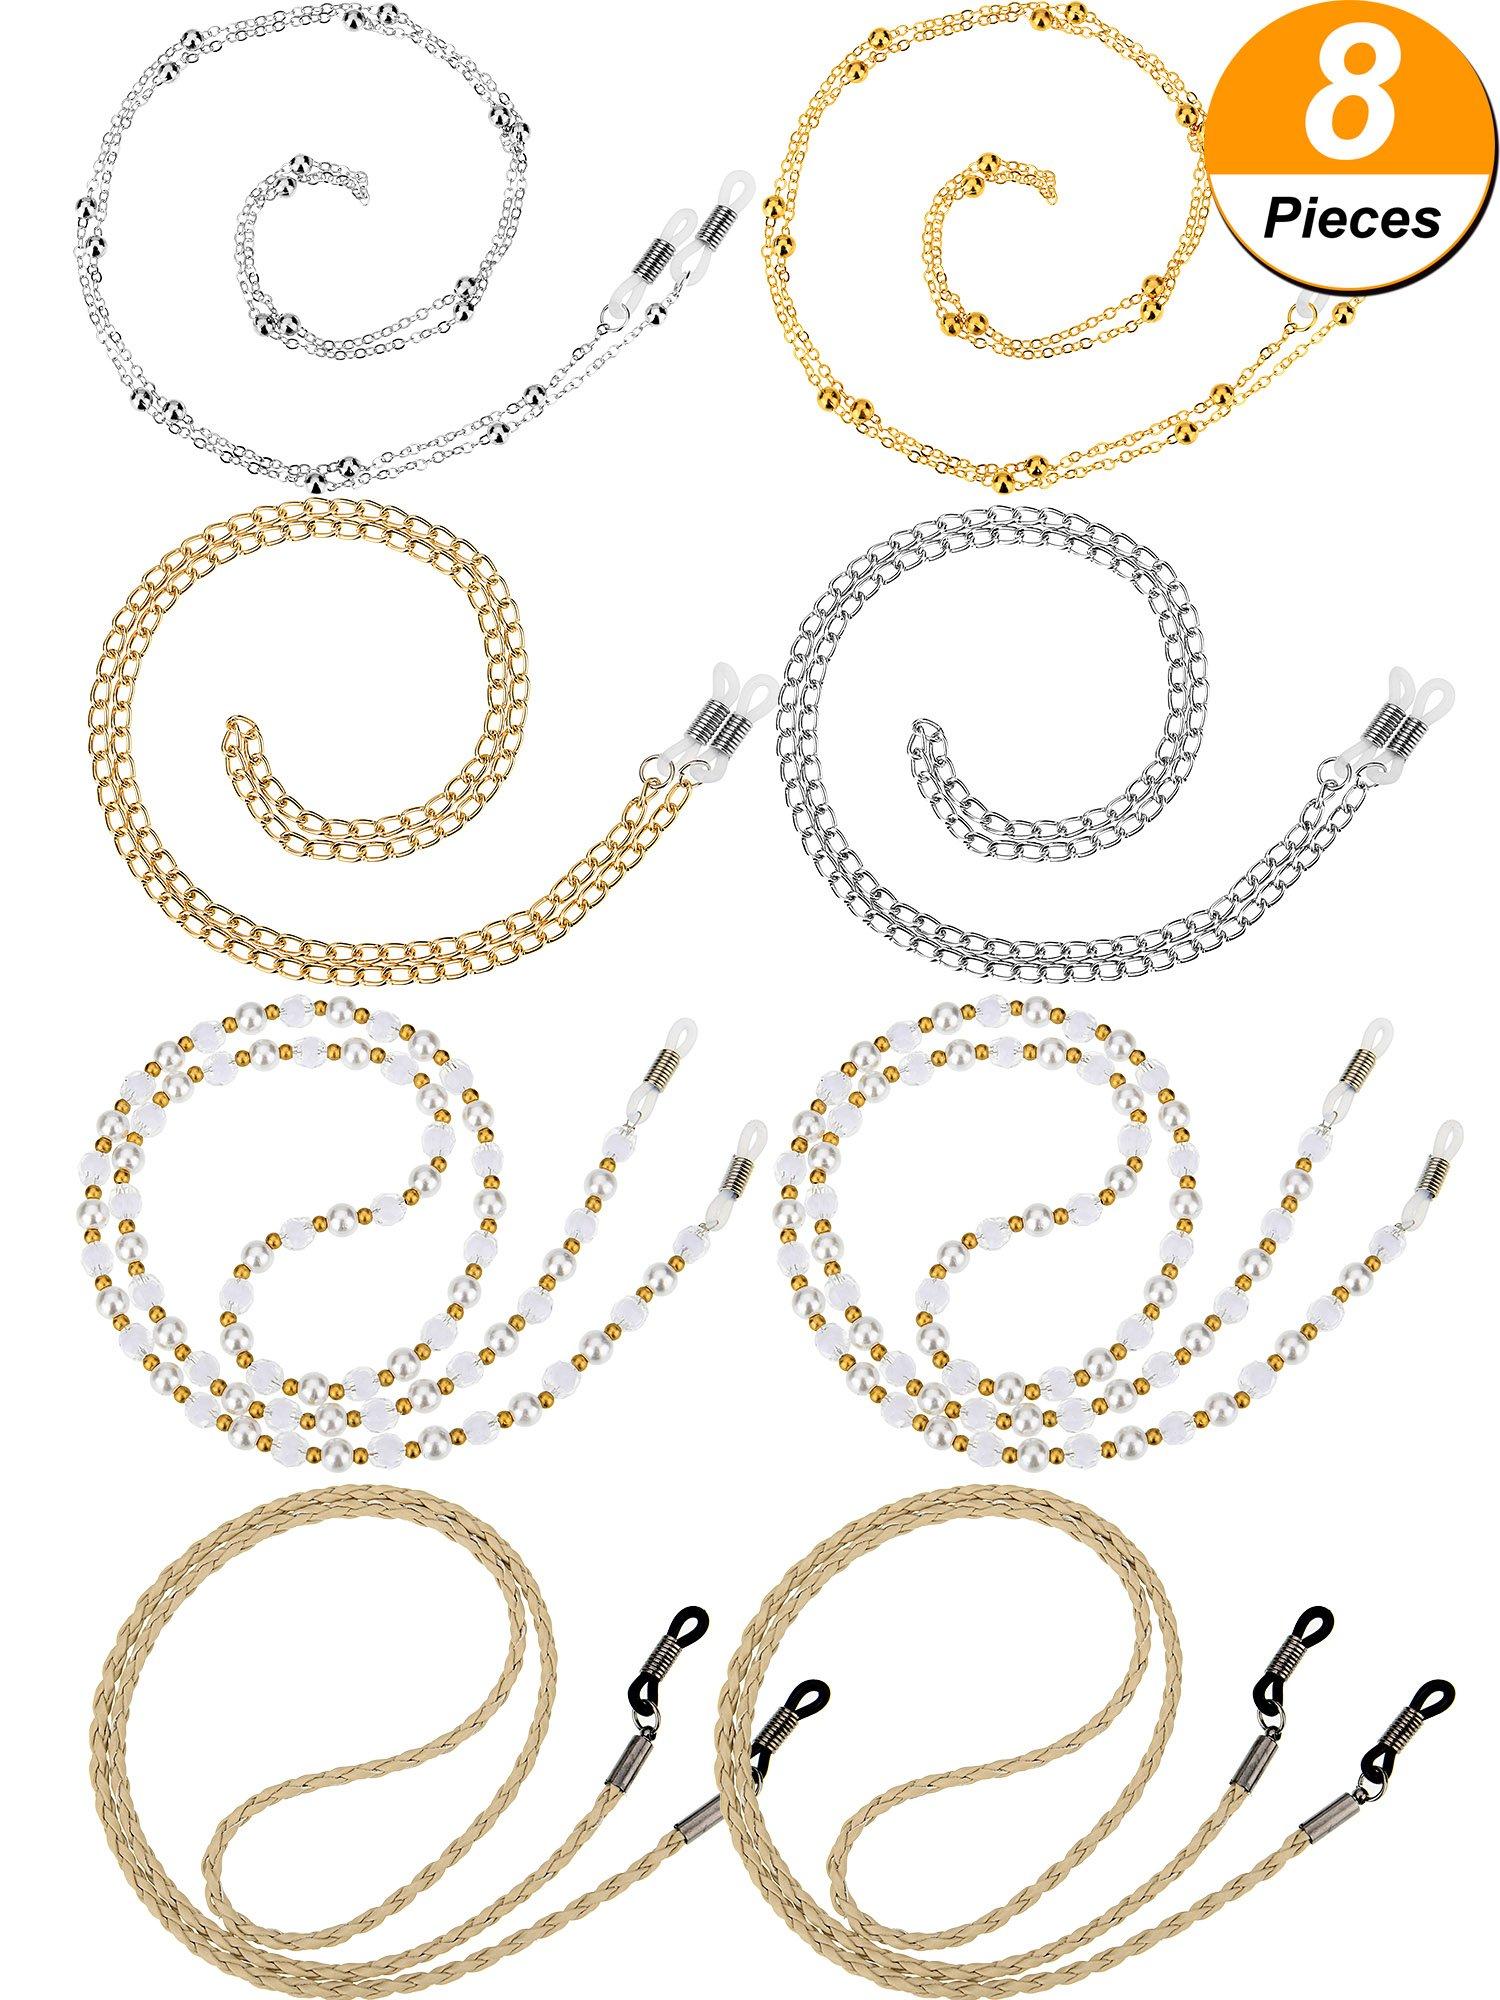 Hestya 8 Pieces Eyeglass Chain Sunglasses Strap Glass Cord Lanyard for Eyeglasses, 4 Styles